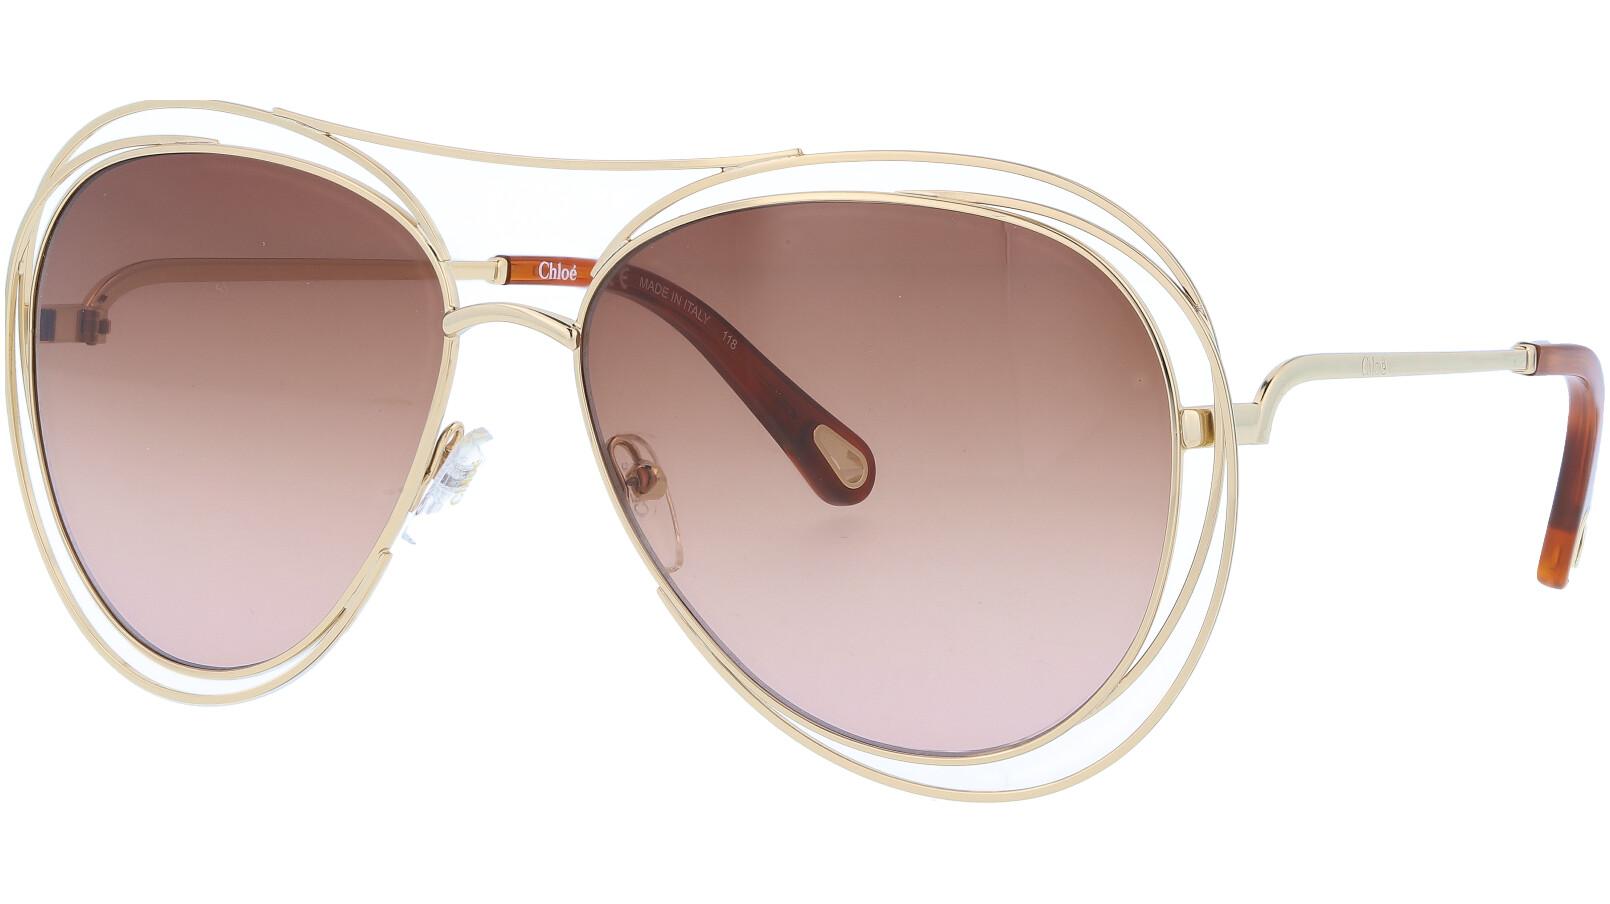 CHLOE CE134S 791 61 GOLD Sunglasses